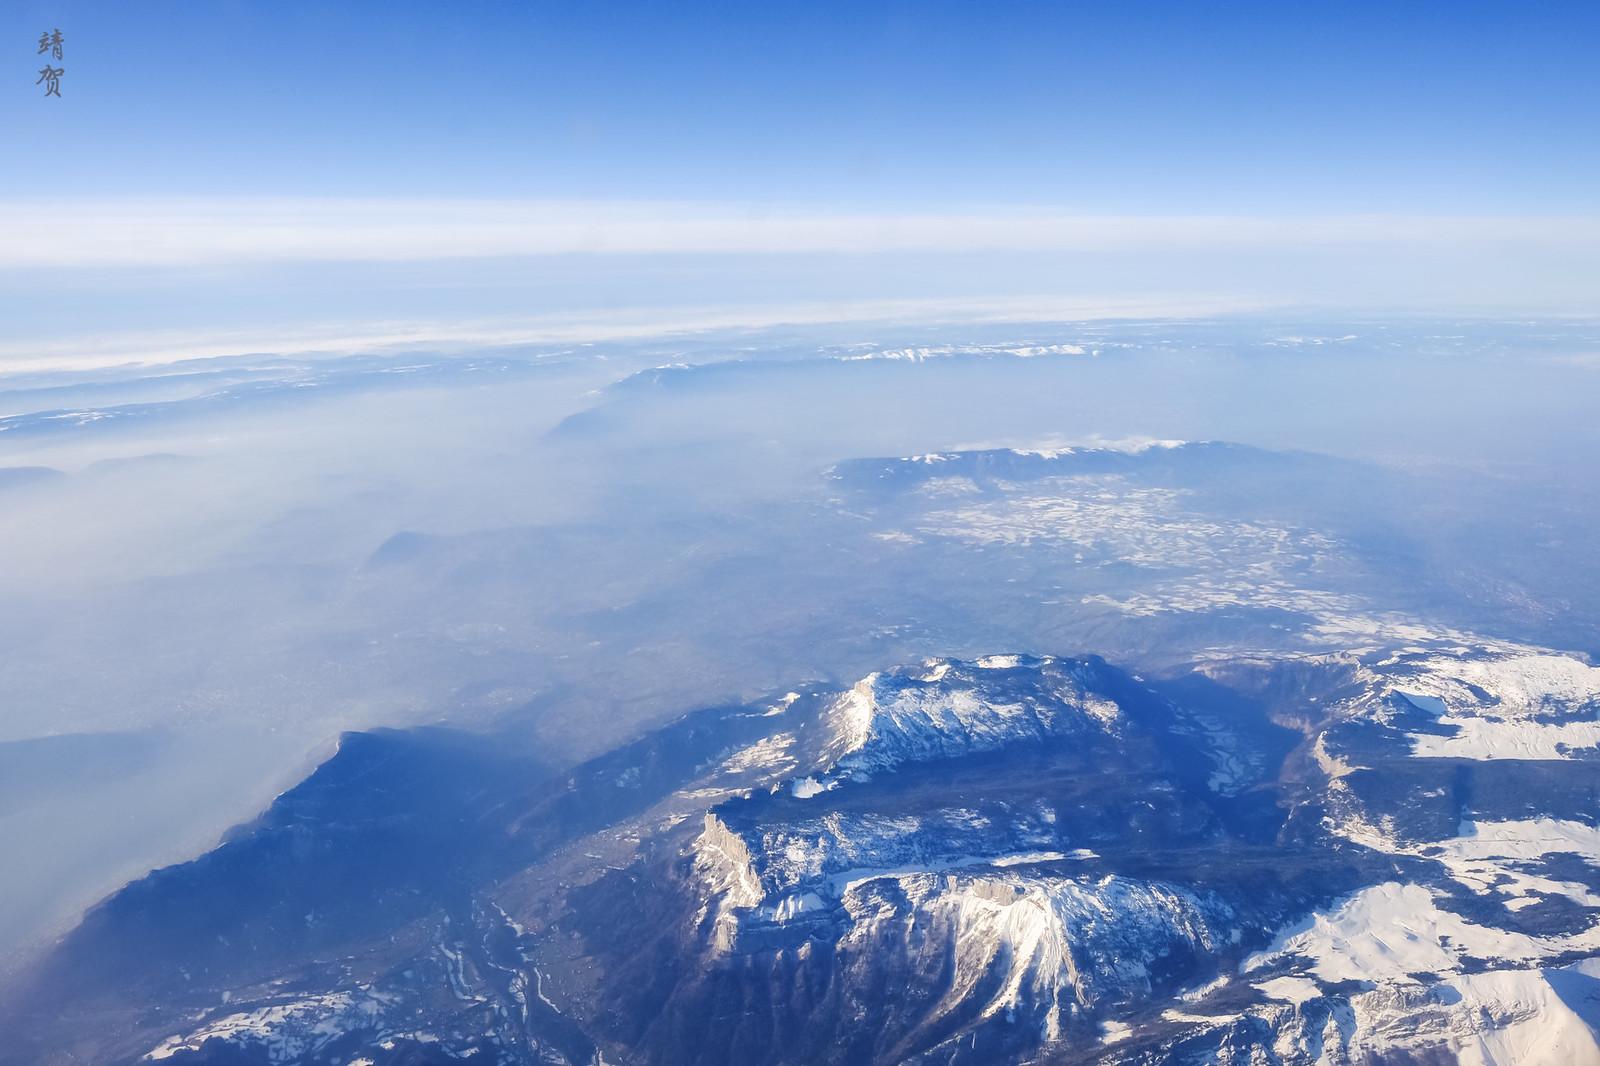 Alps of Haute-Savoie